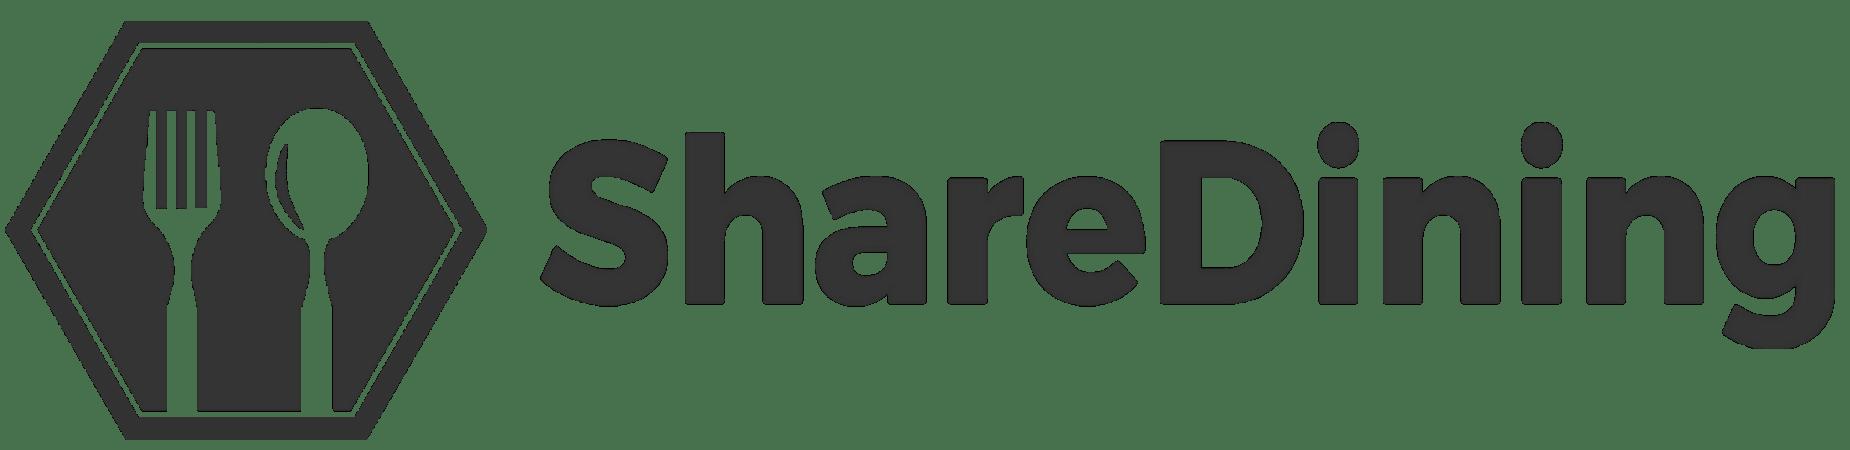 ShareDining Horizontal Logo - Black